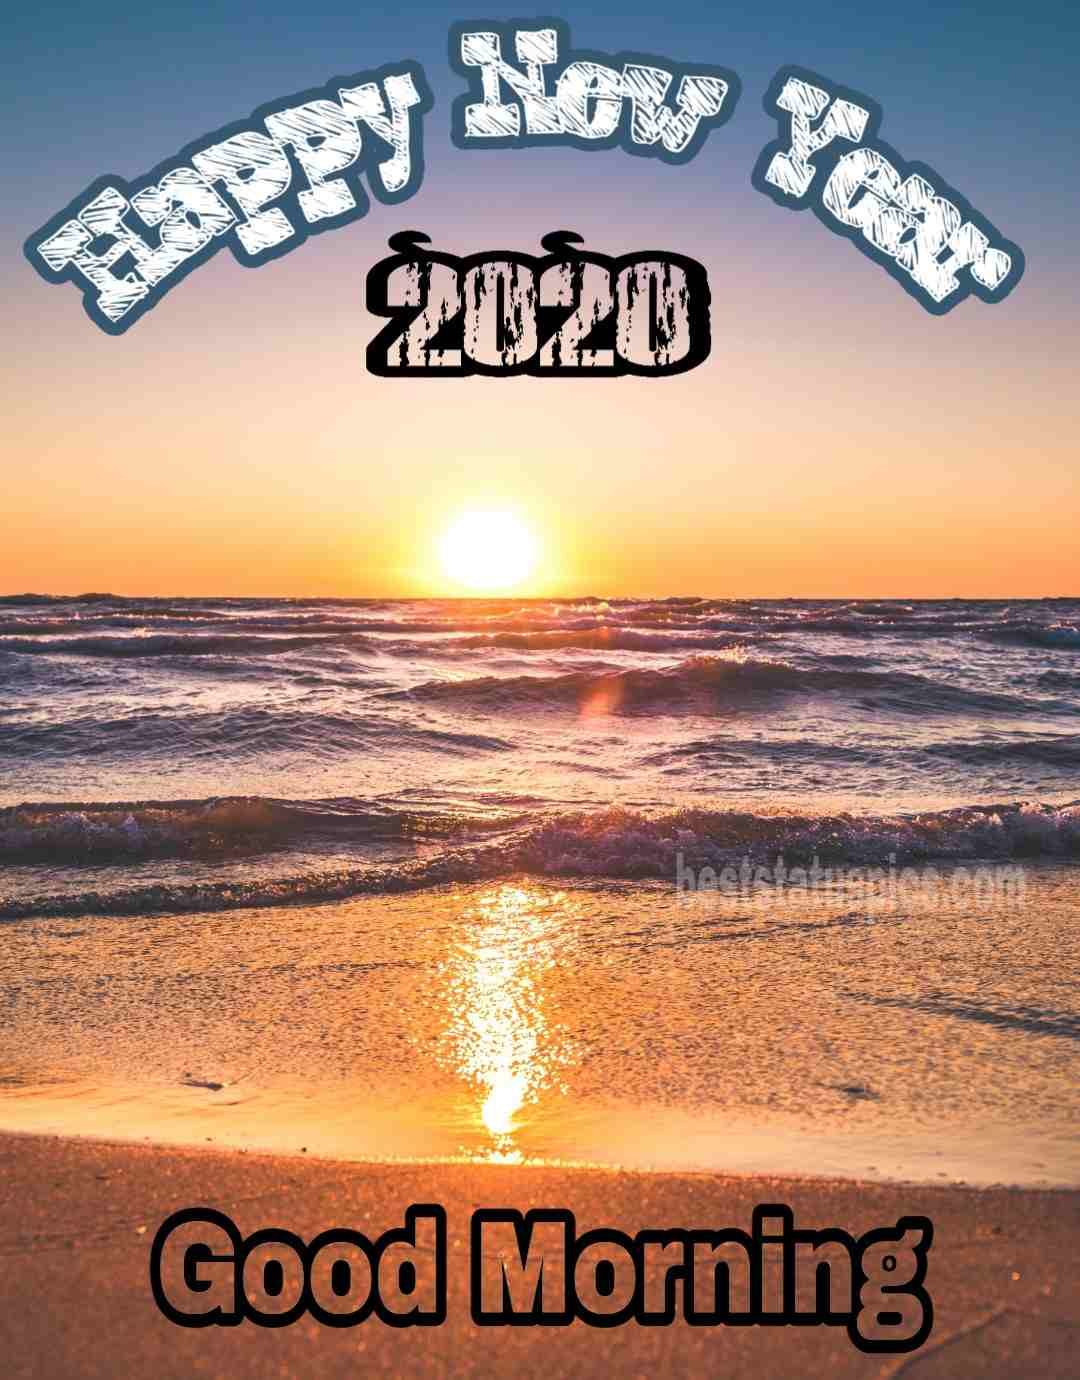 Good morning happy new year 2020 photo Instagram Story